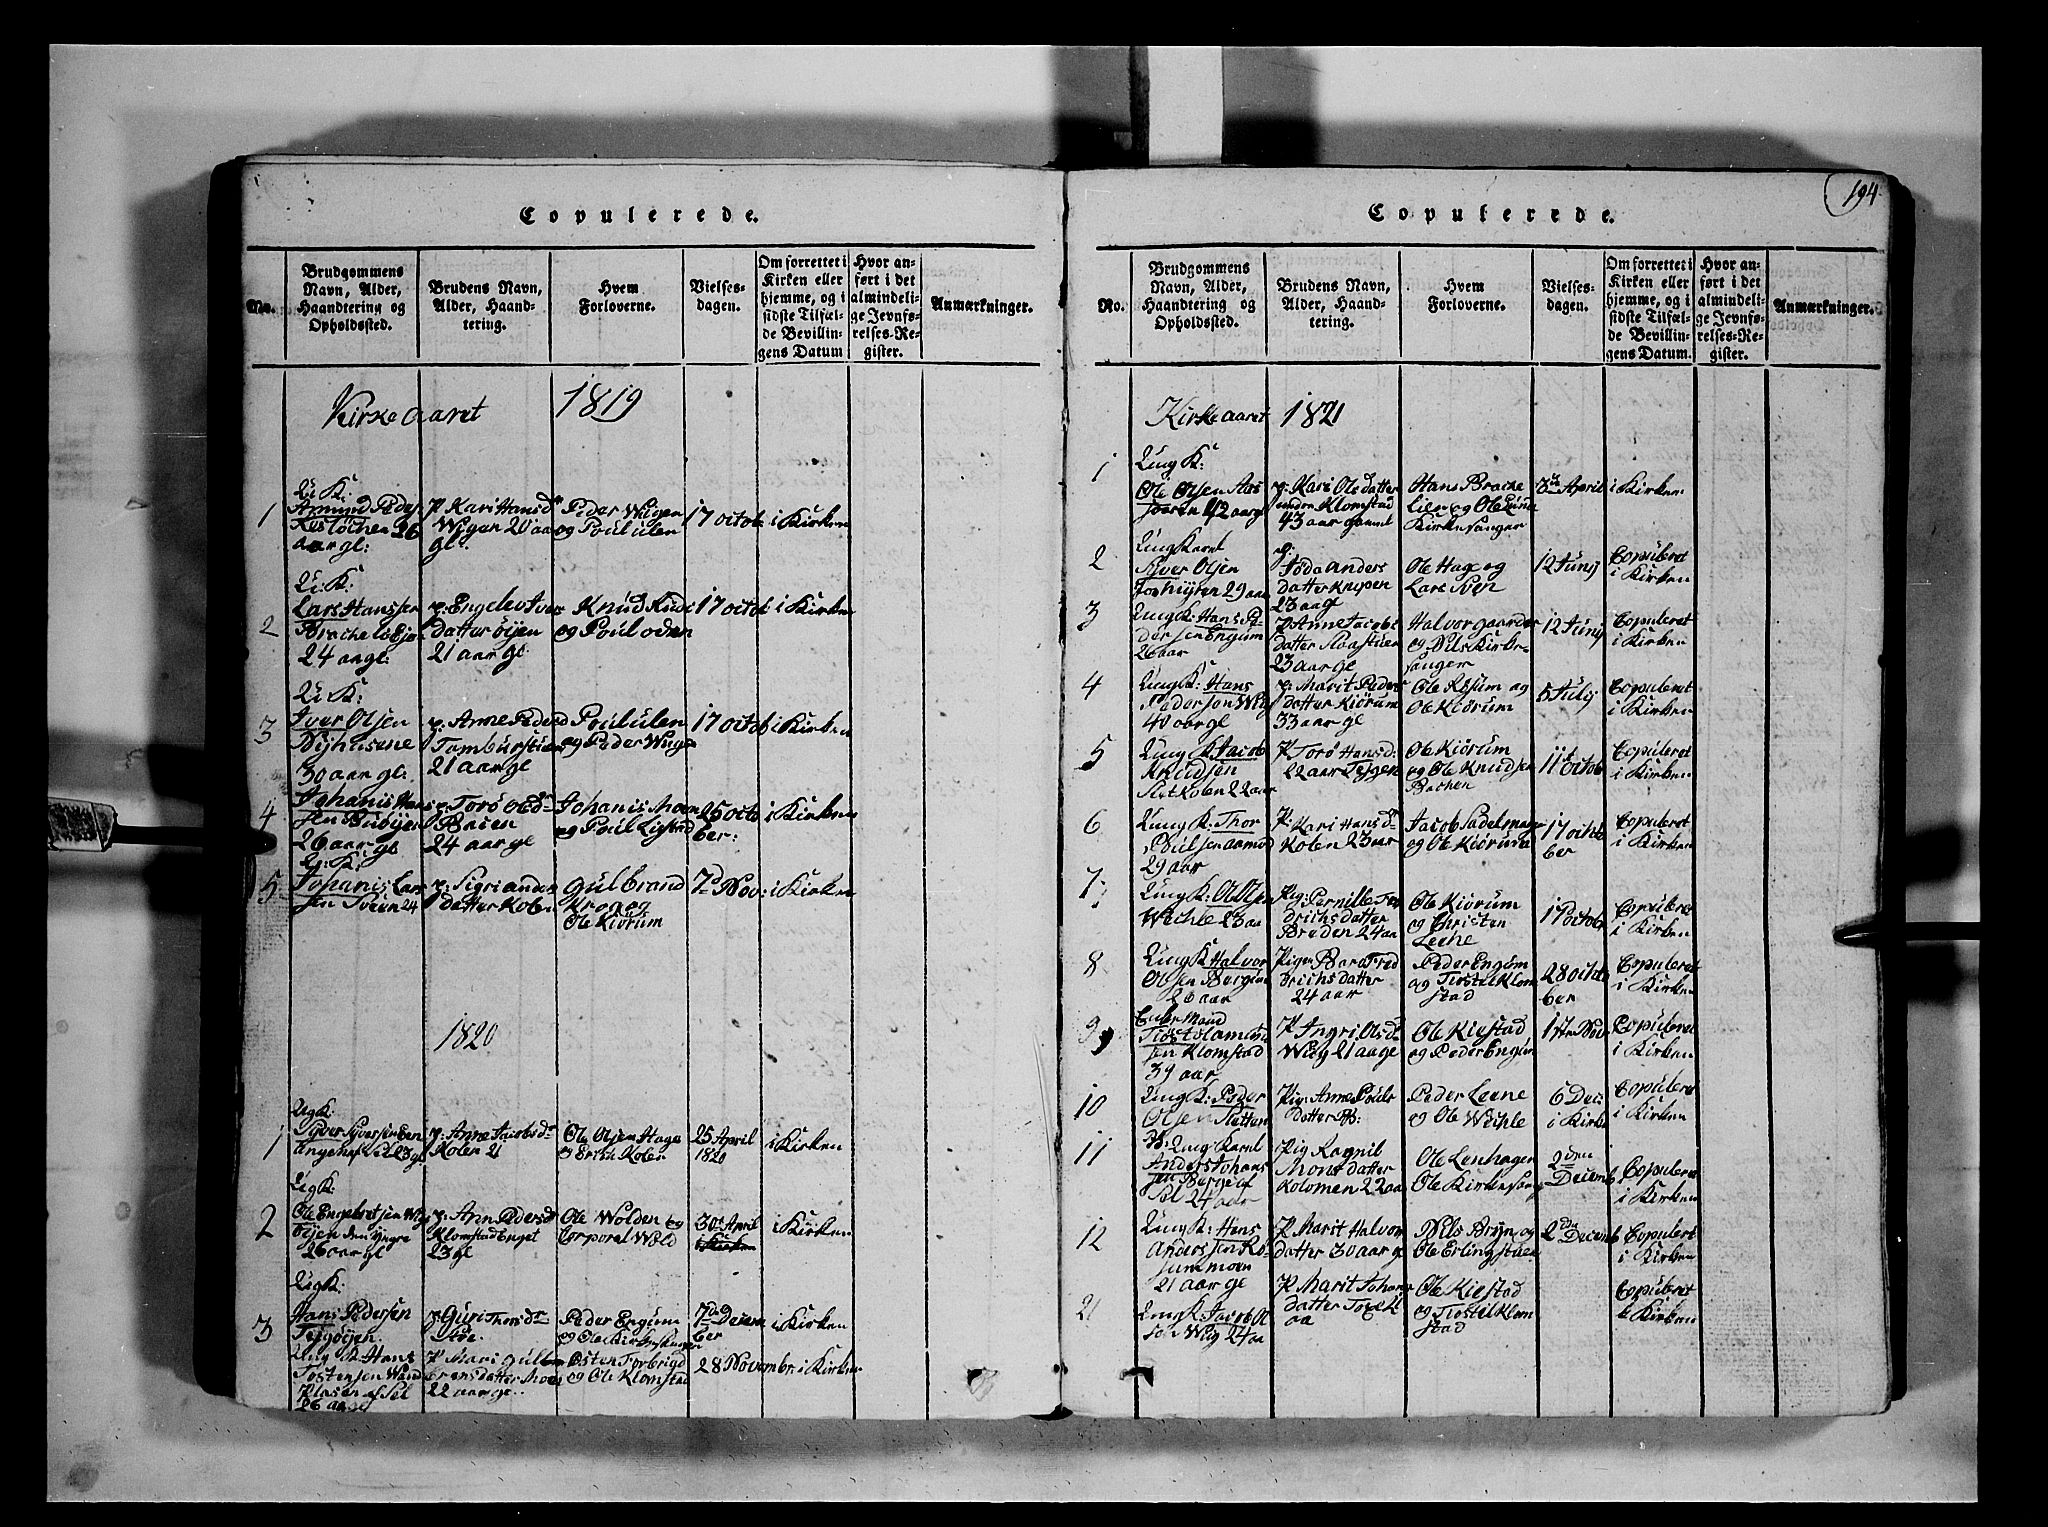 SAH, Fron prestekontor, H/Ha/Hab/L0002: Klokkerbok nr. 2, 1816-1850, s. 194